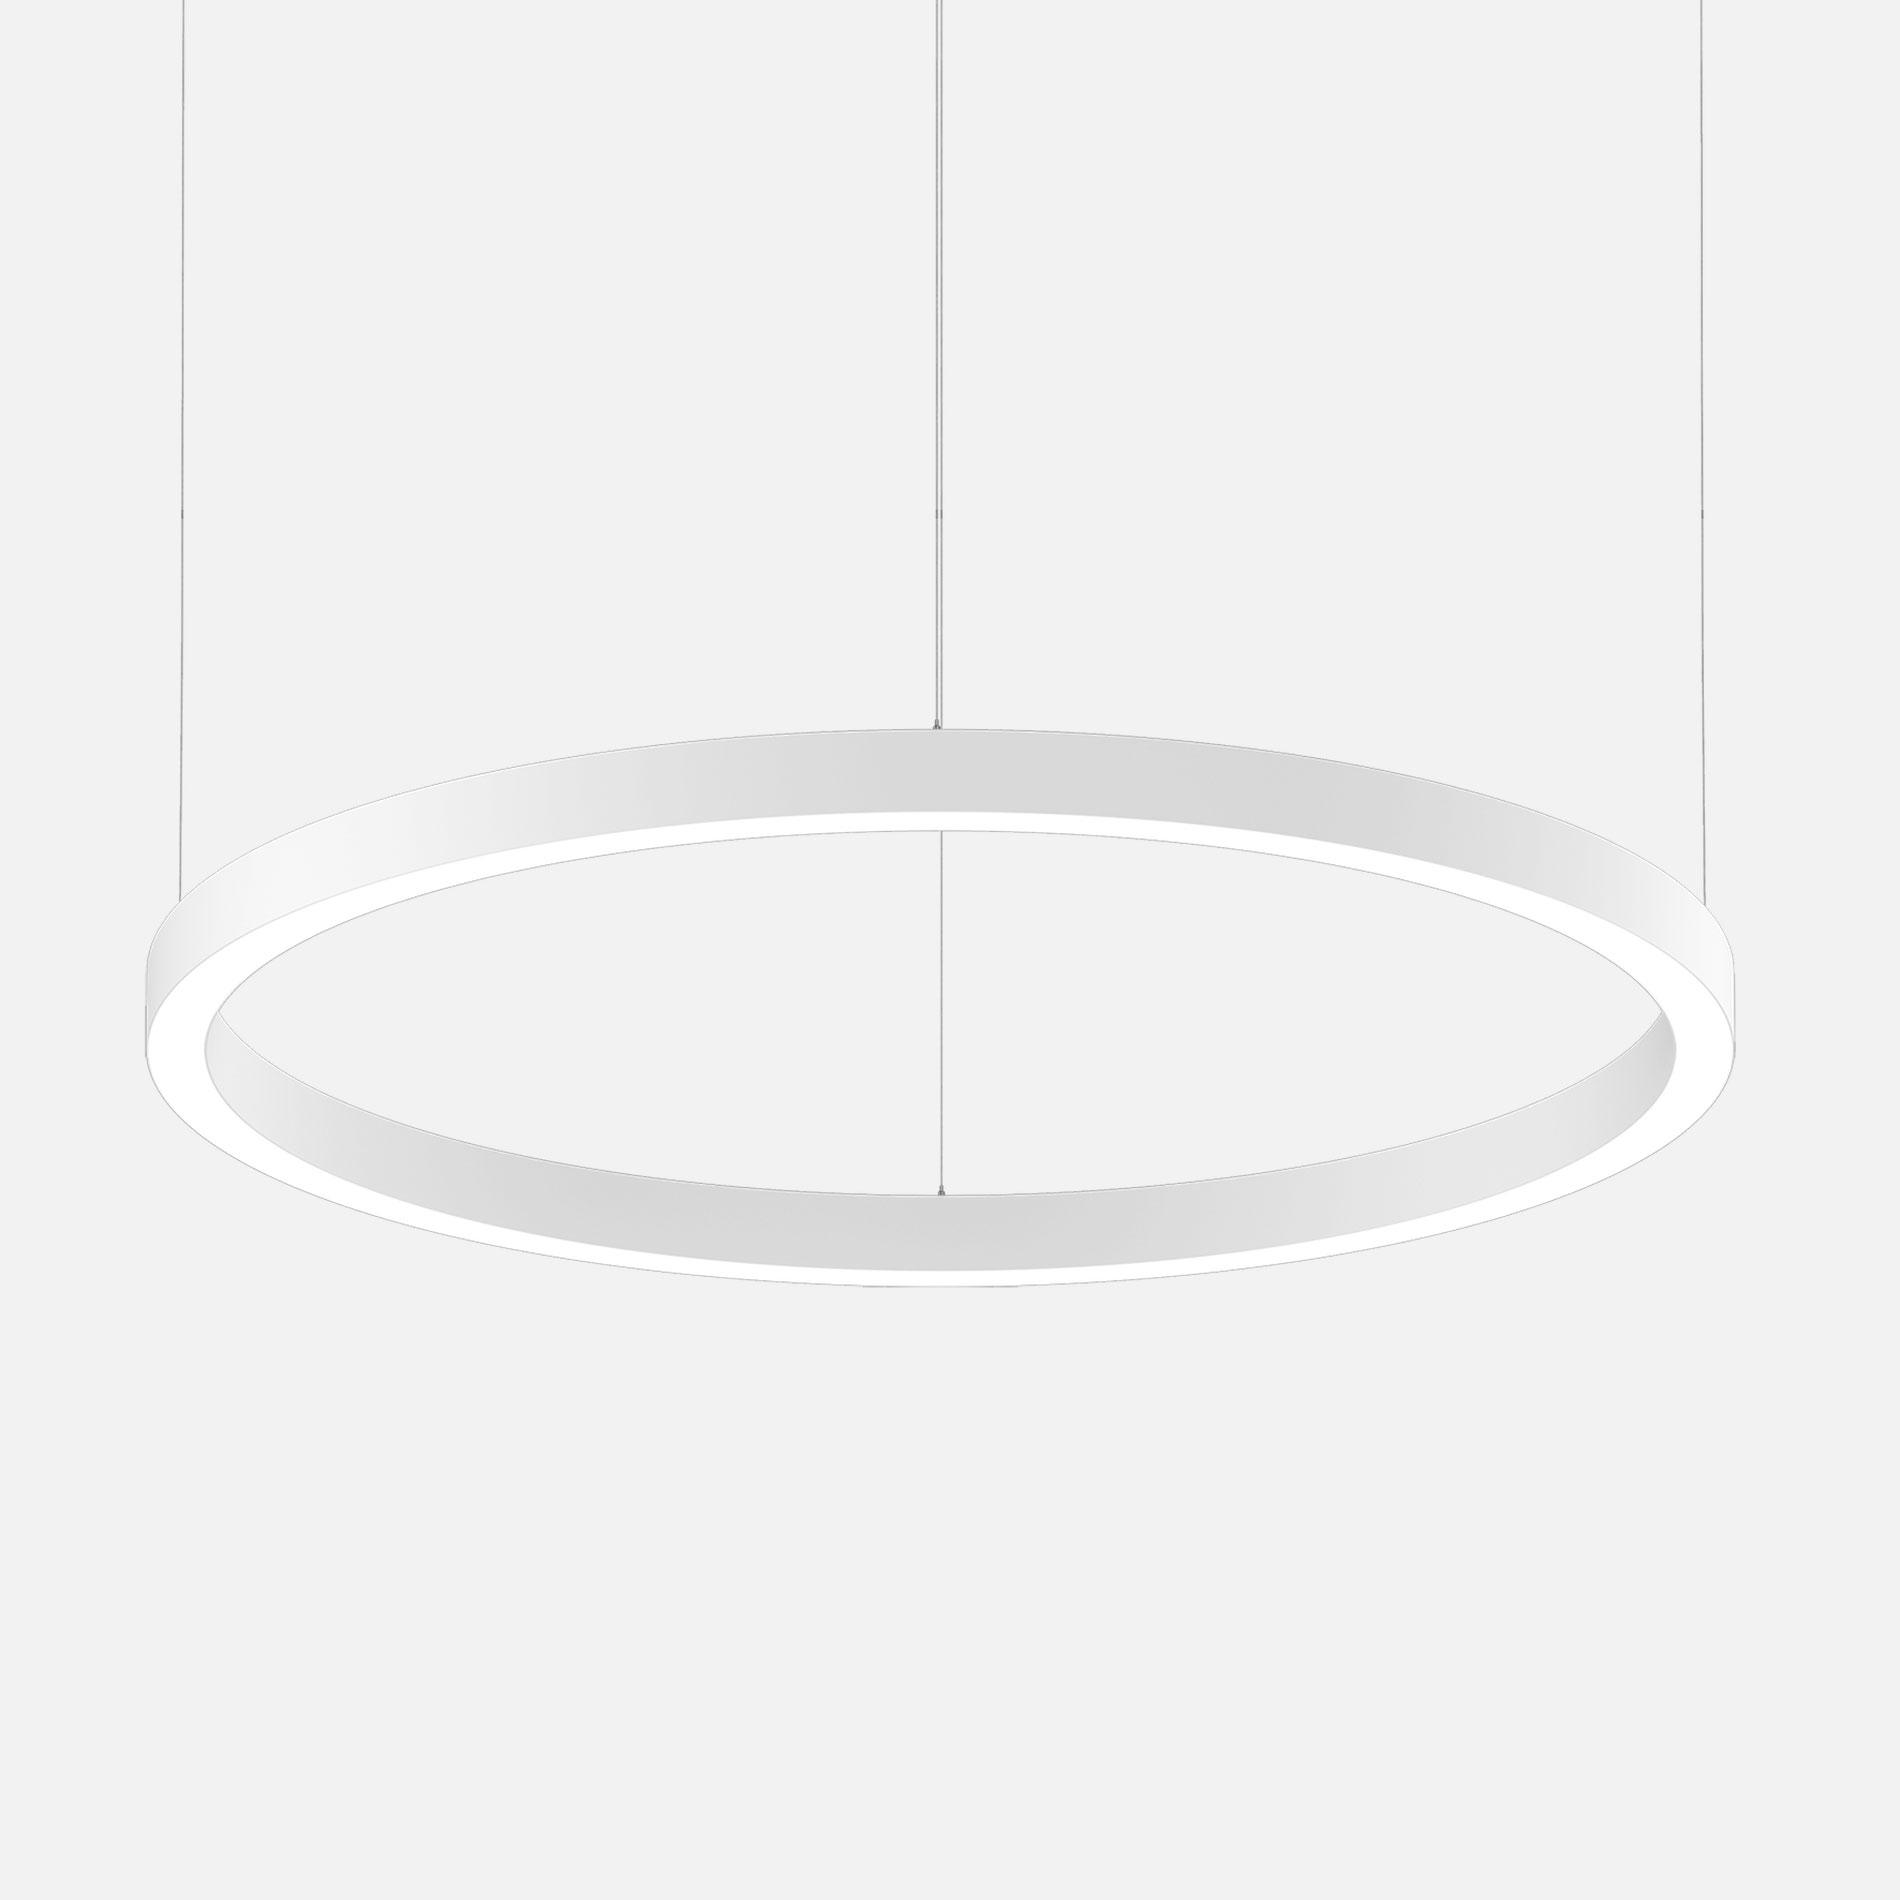 Mino 60 circle 1500 suspended white 2